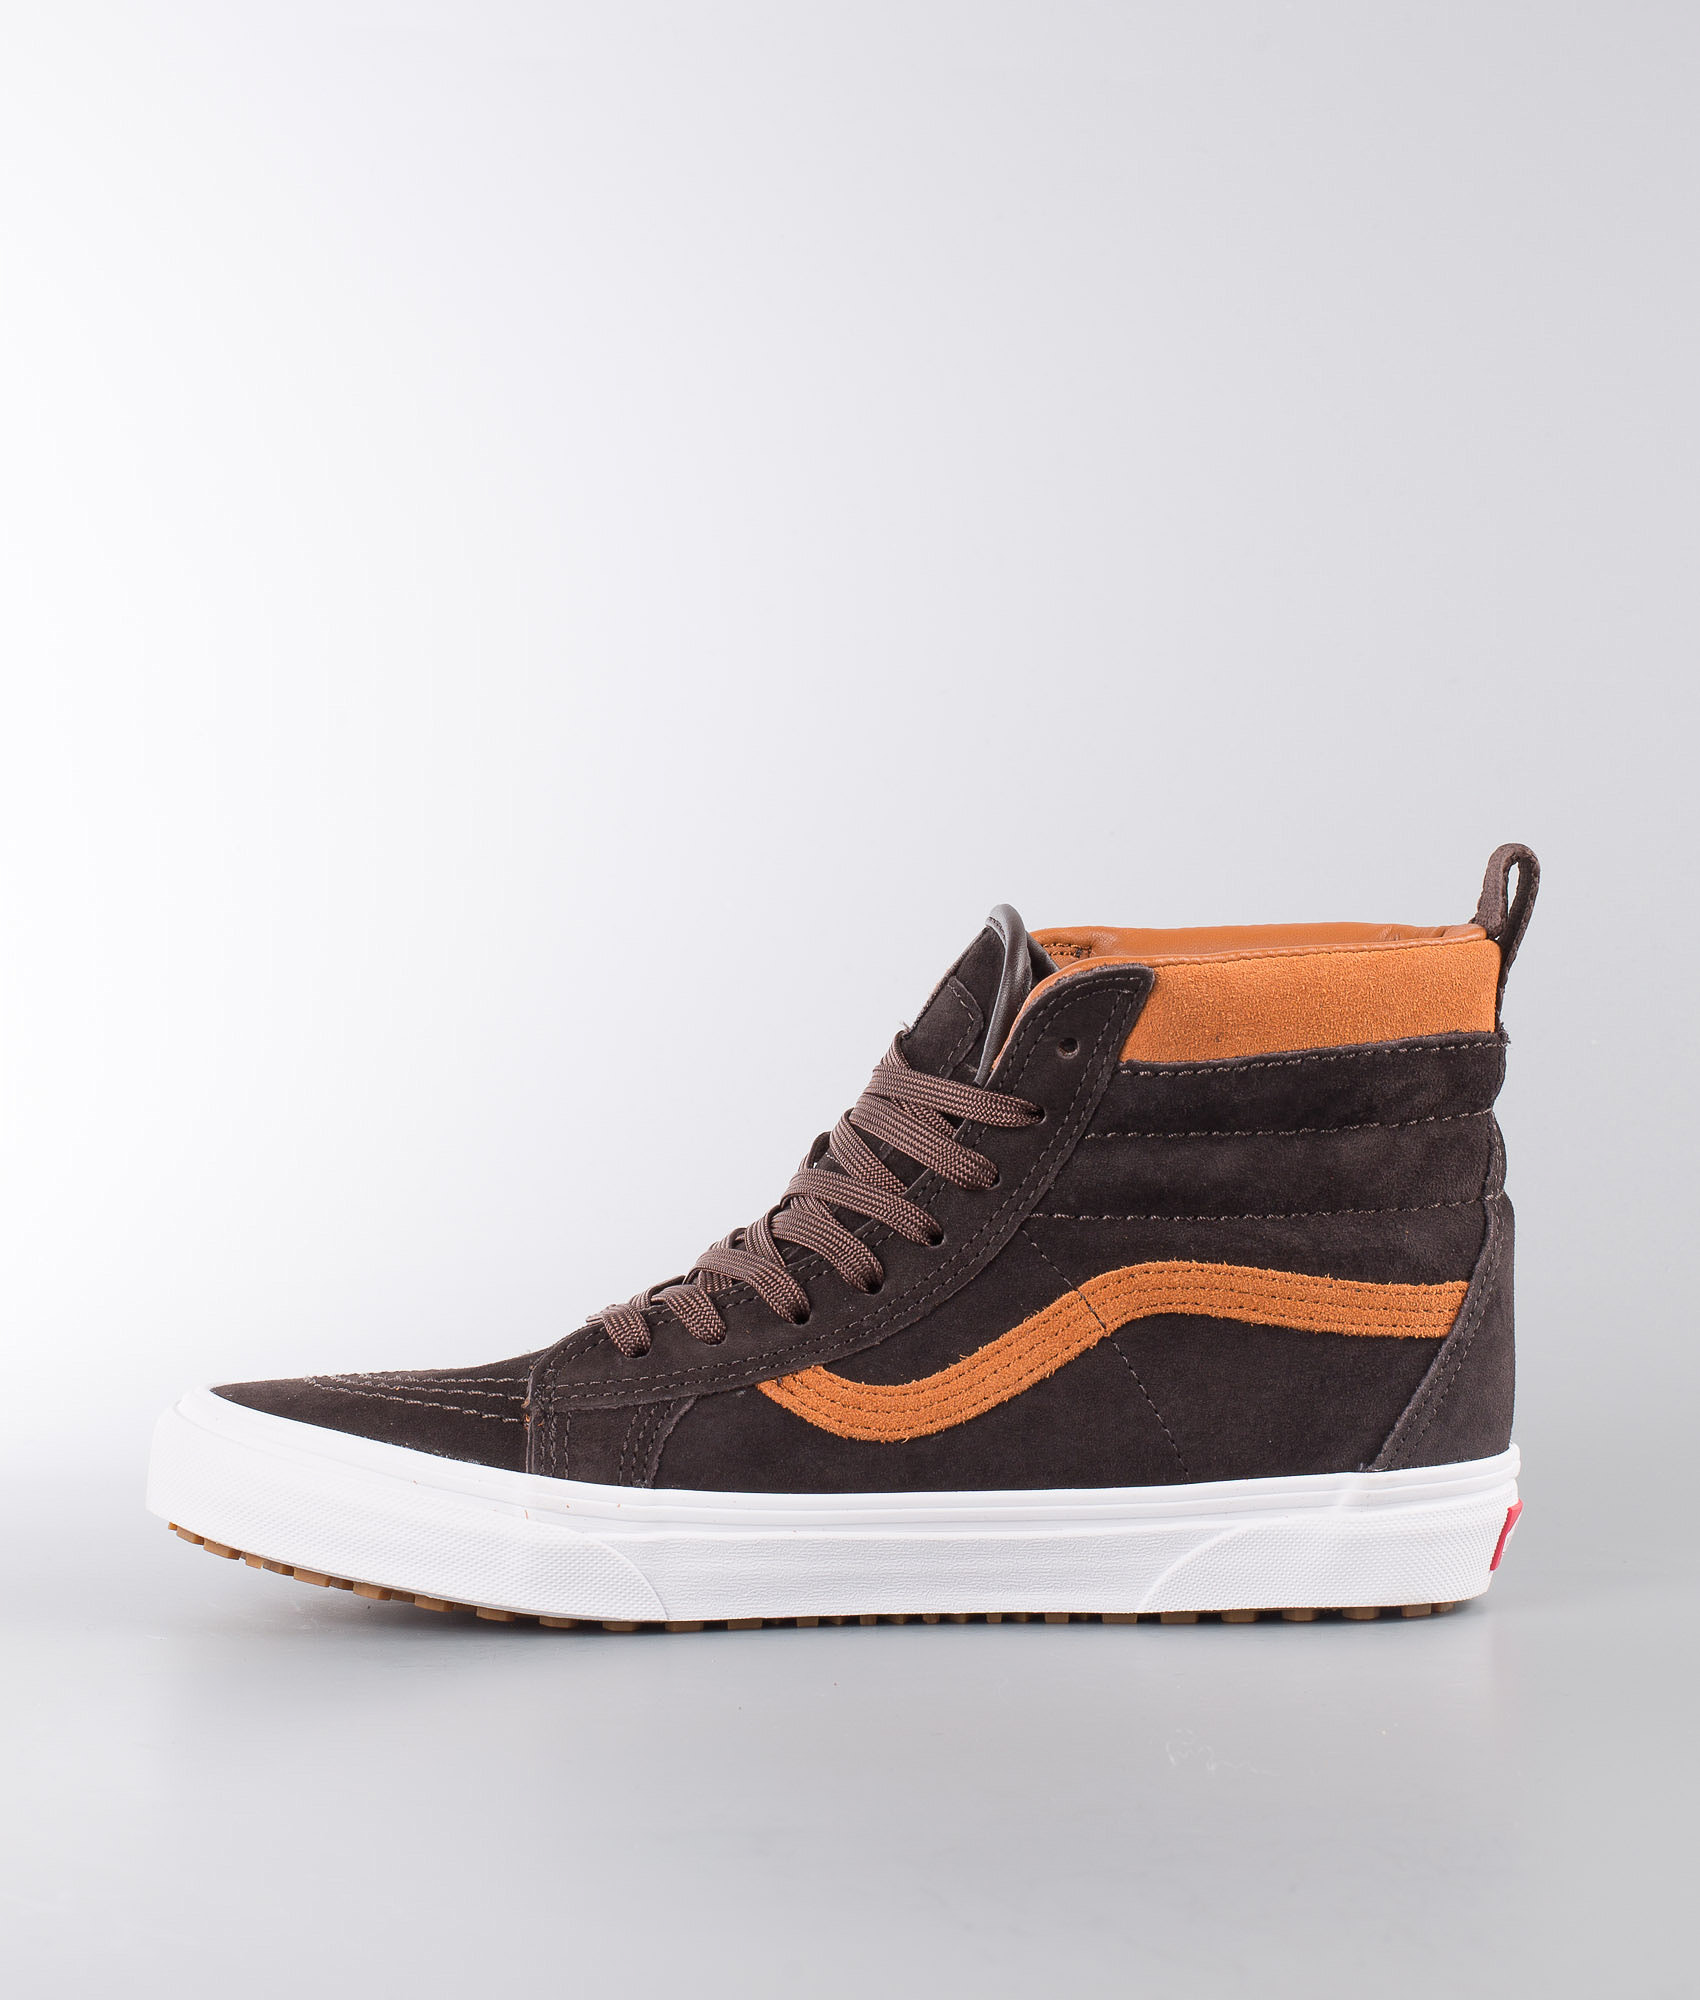 Vans Sk8-Hi Mte Shoes (Mte) Suede Chocolate Torte - Ridestore.com 32907cc38e53b